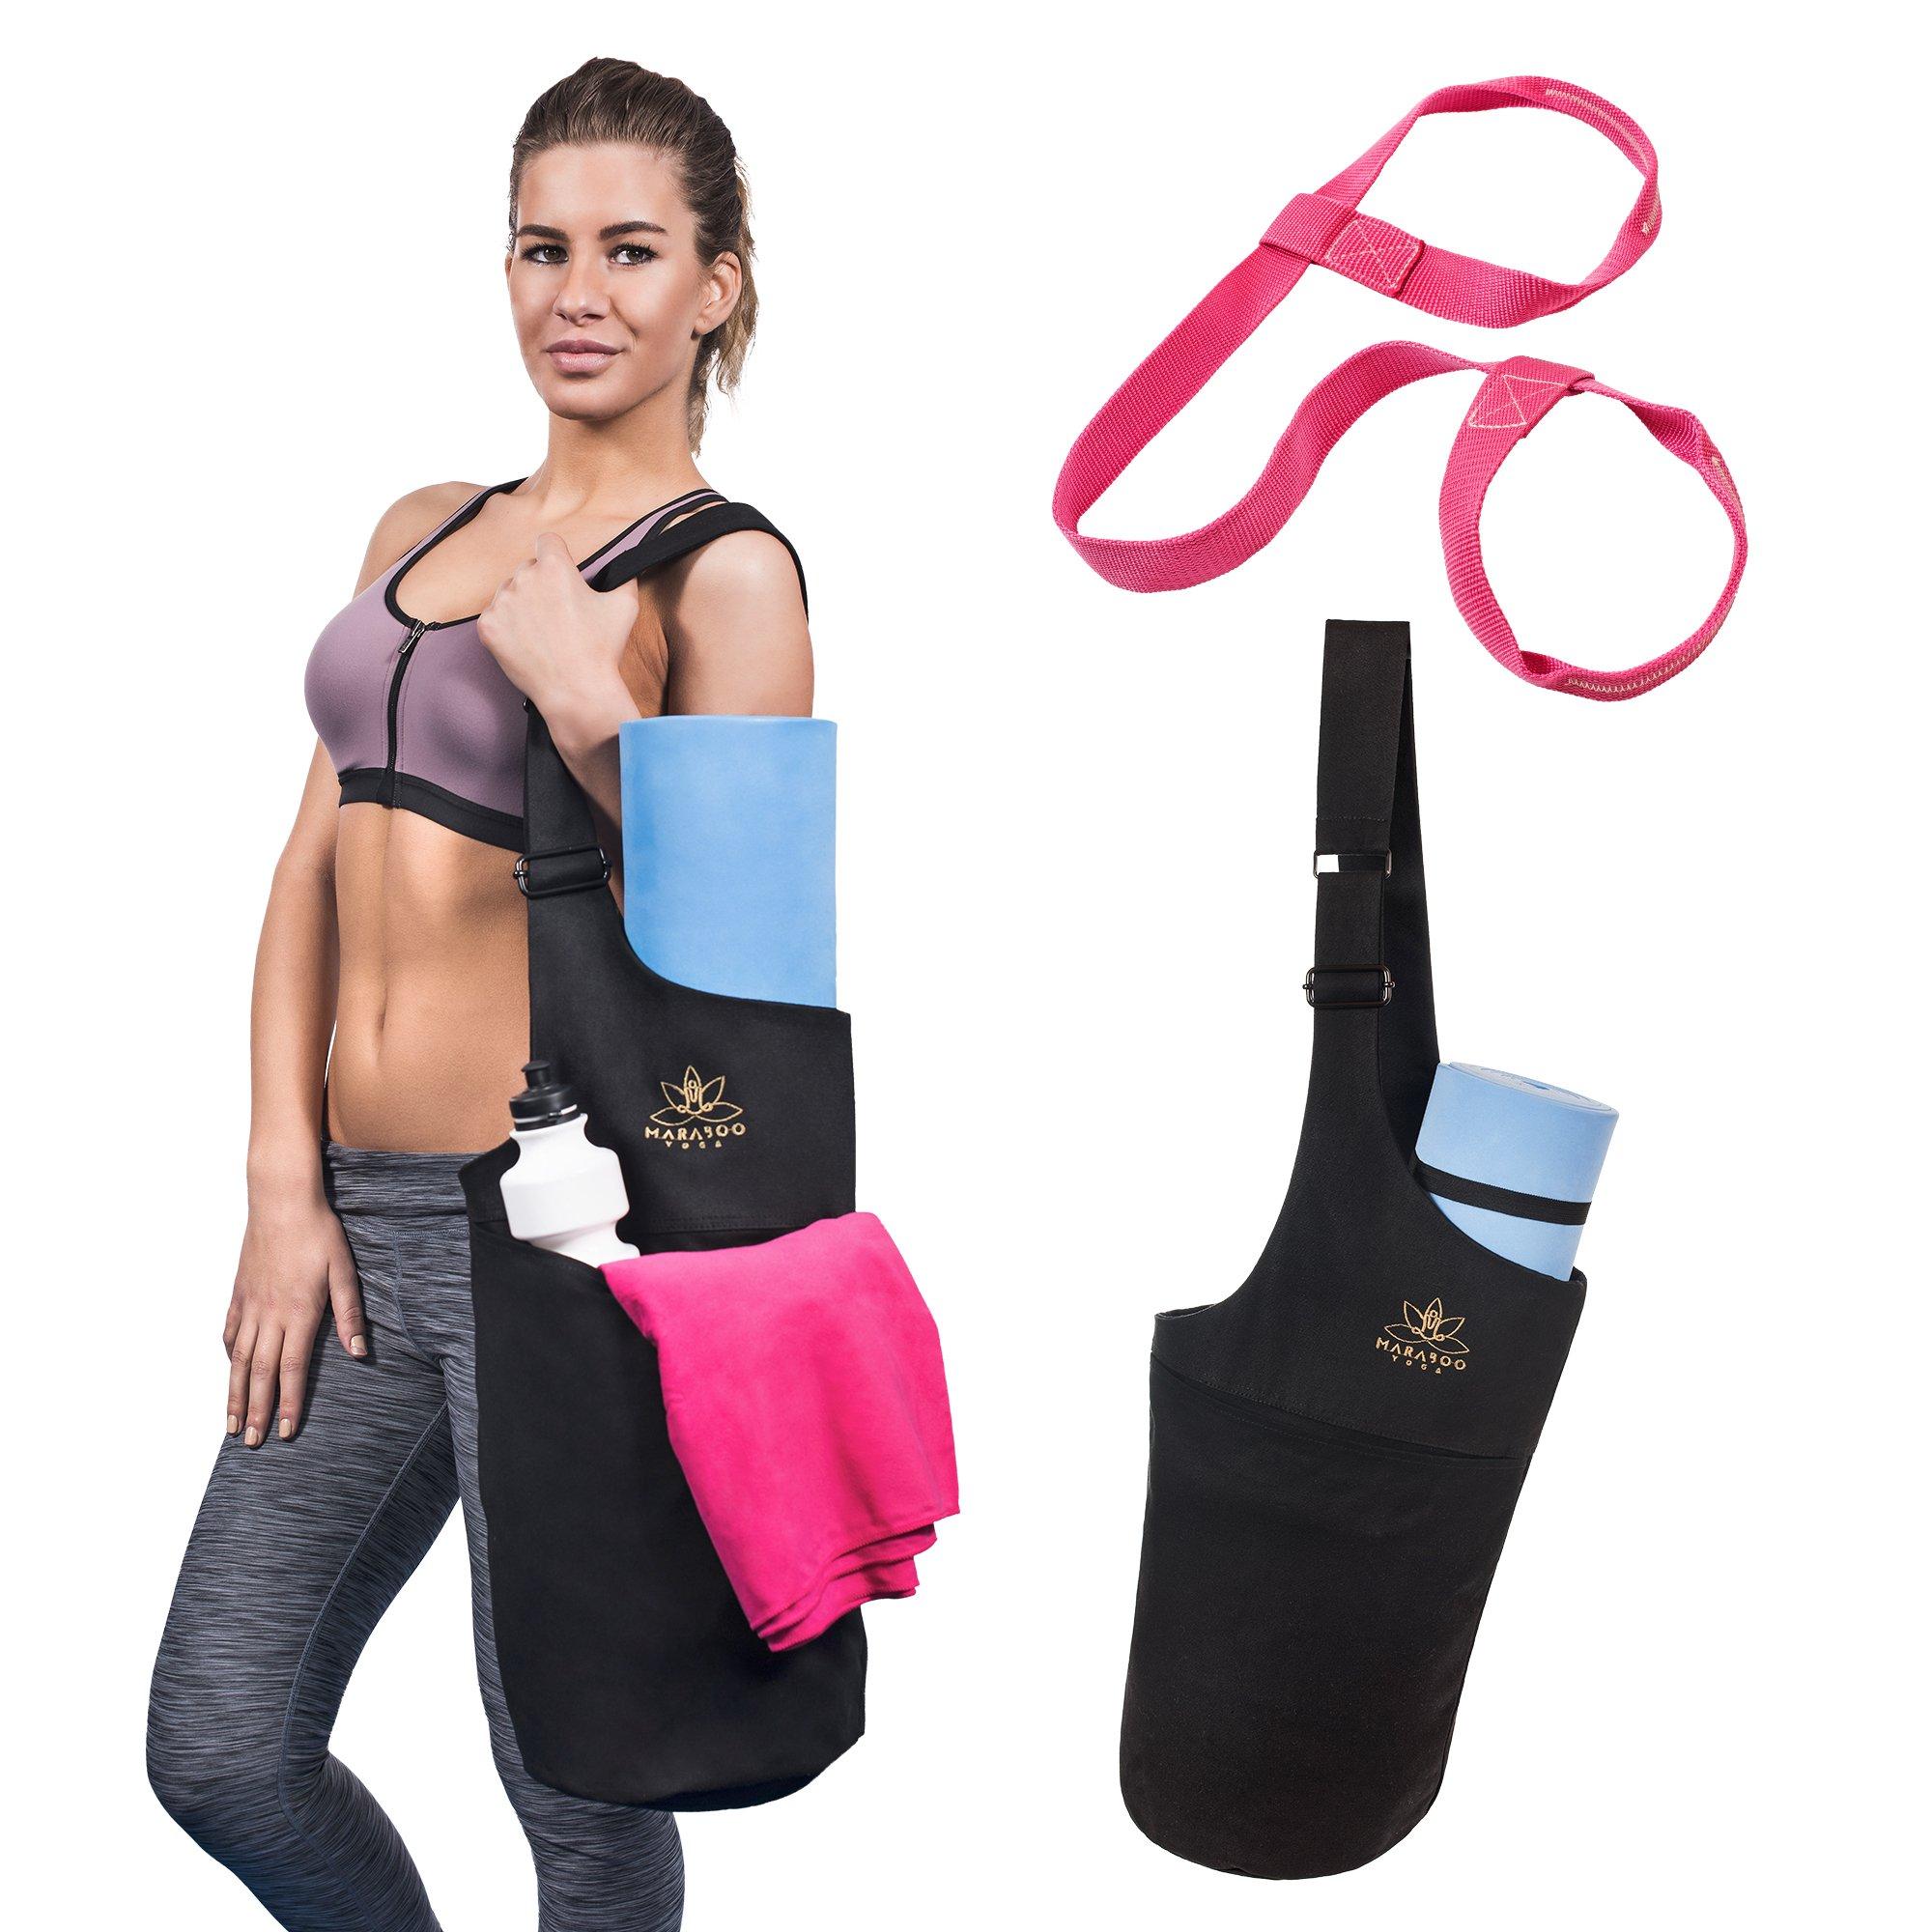 Maraboo Yoga Mat Bag - Yoga Mat Carry Bag With Yoga Carrier Strap and Free Ebook- Adjustable Shoulder Strap - Storage Pockets and Water Bottle Holder